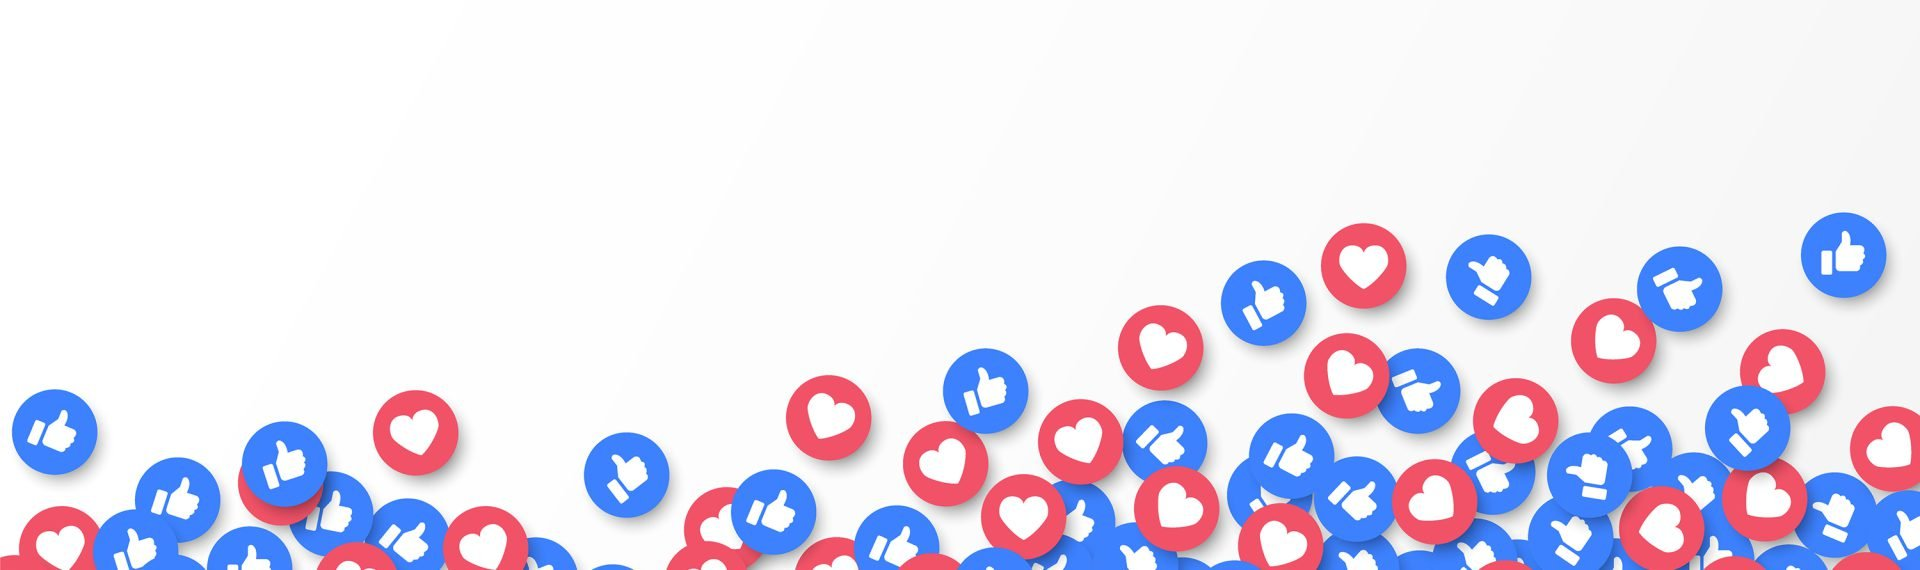 Do tradesmen need social media?